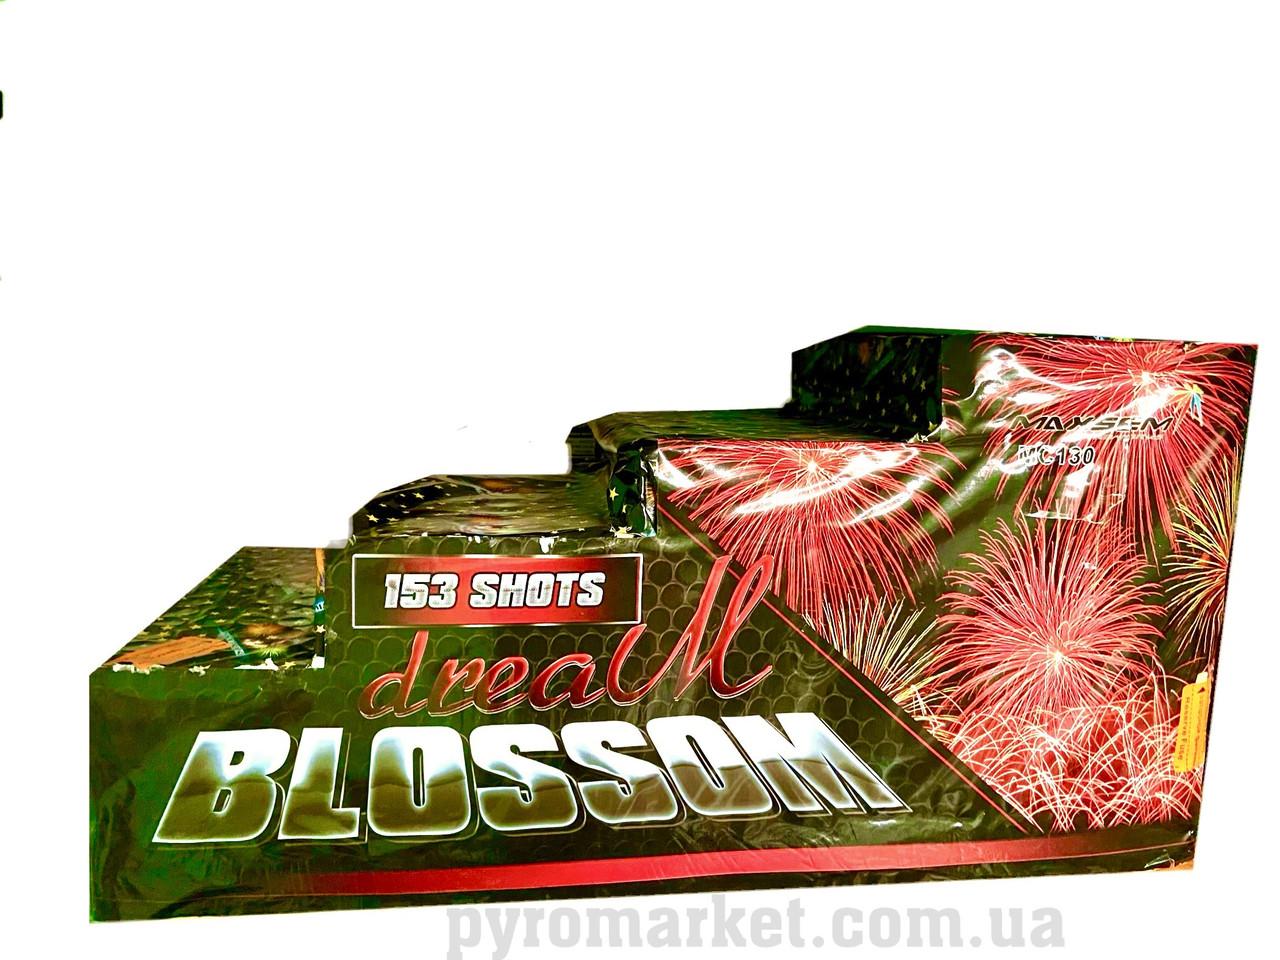 Салют Dream Blossom Maxsem MC130, 153 выстрелов 20-63 мм